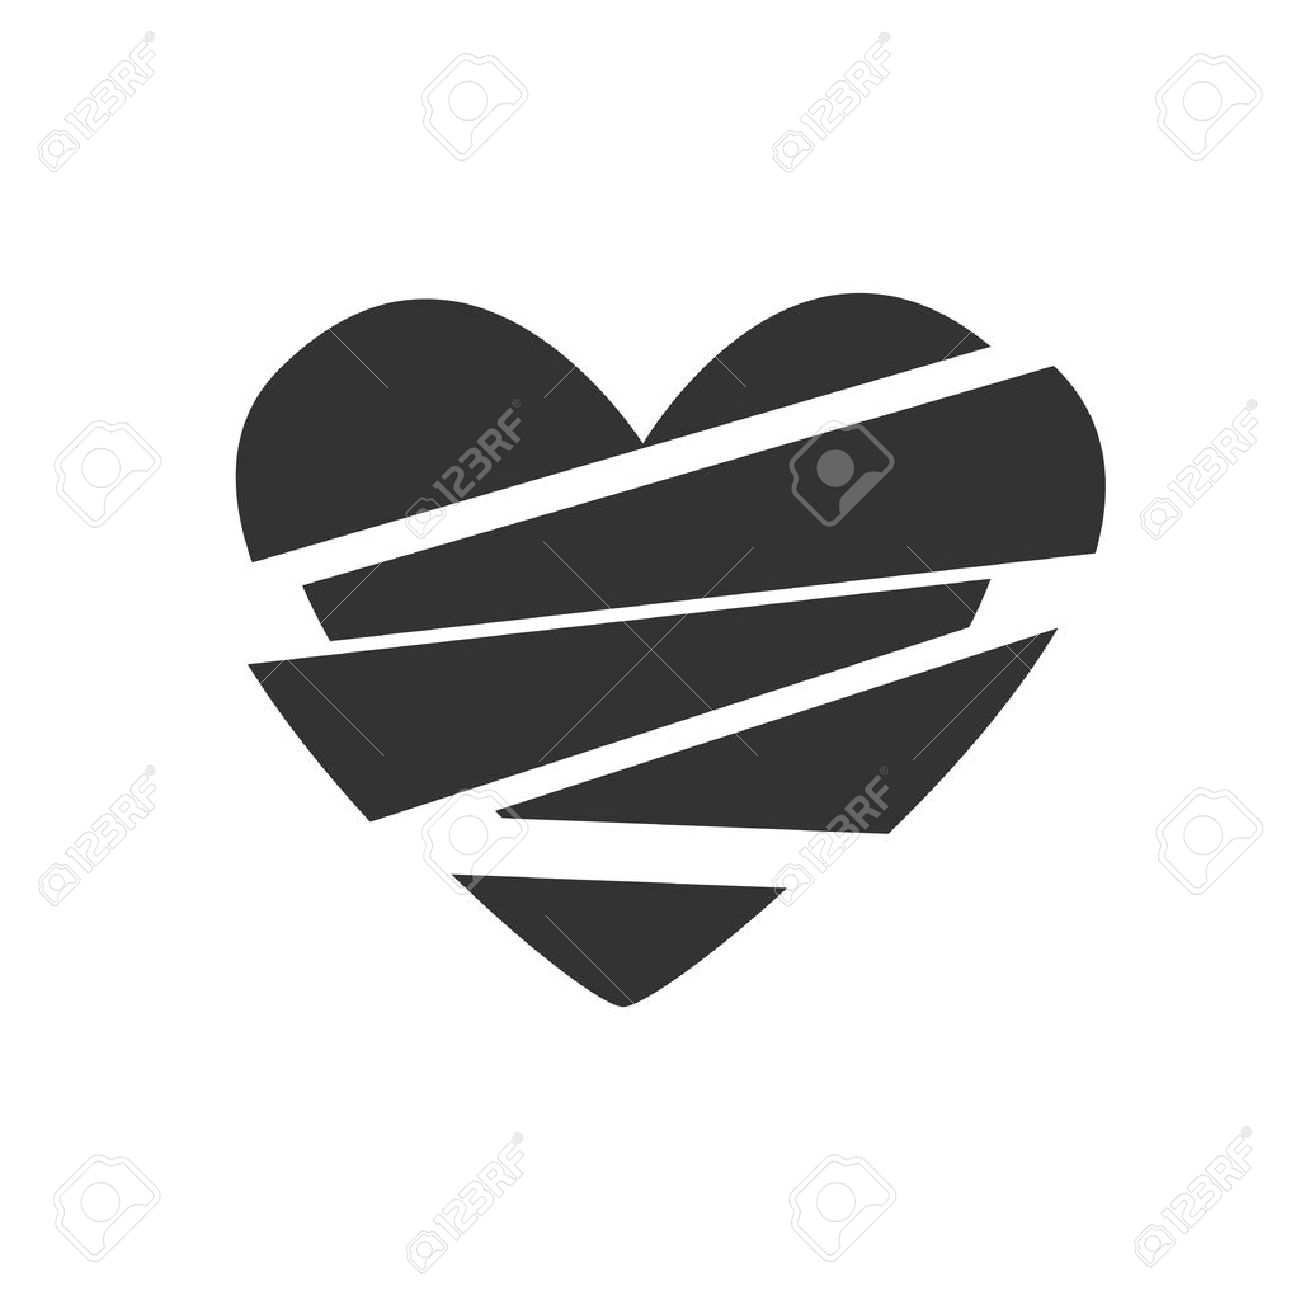 Black and white sign vector symbol icon broken heart royalty free black and white sign vector symbol icon broken heart stock vector 46365194 buycottarizona